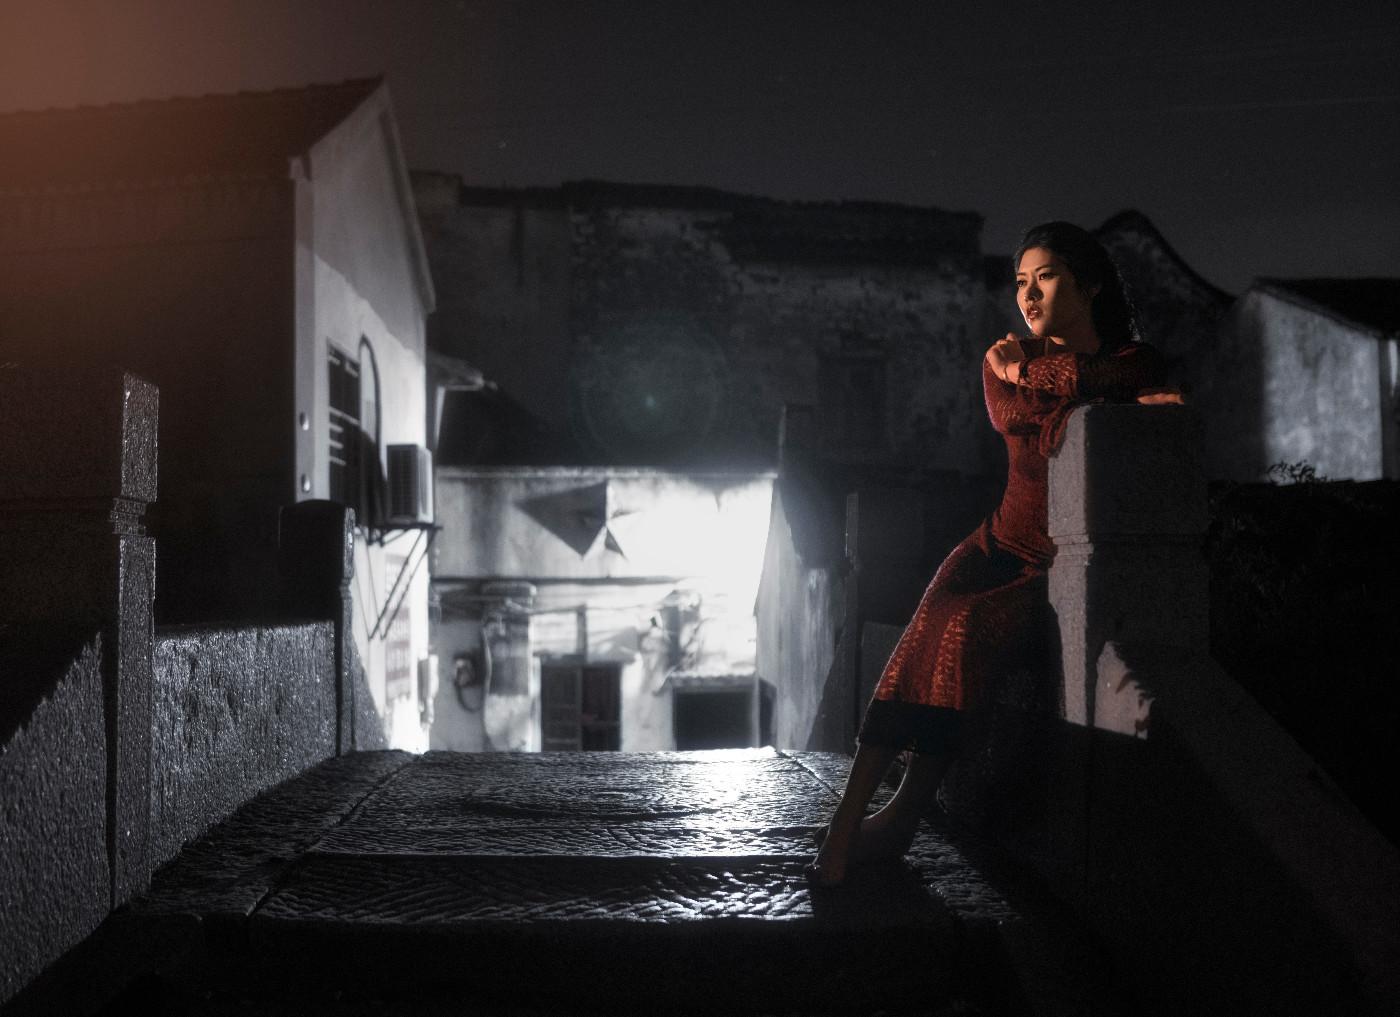 [KAI 写真]盛泽夜色2